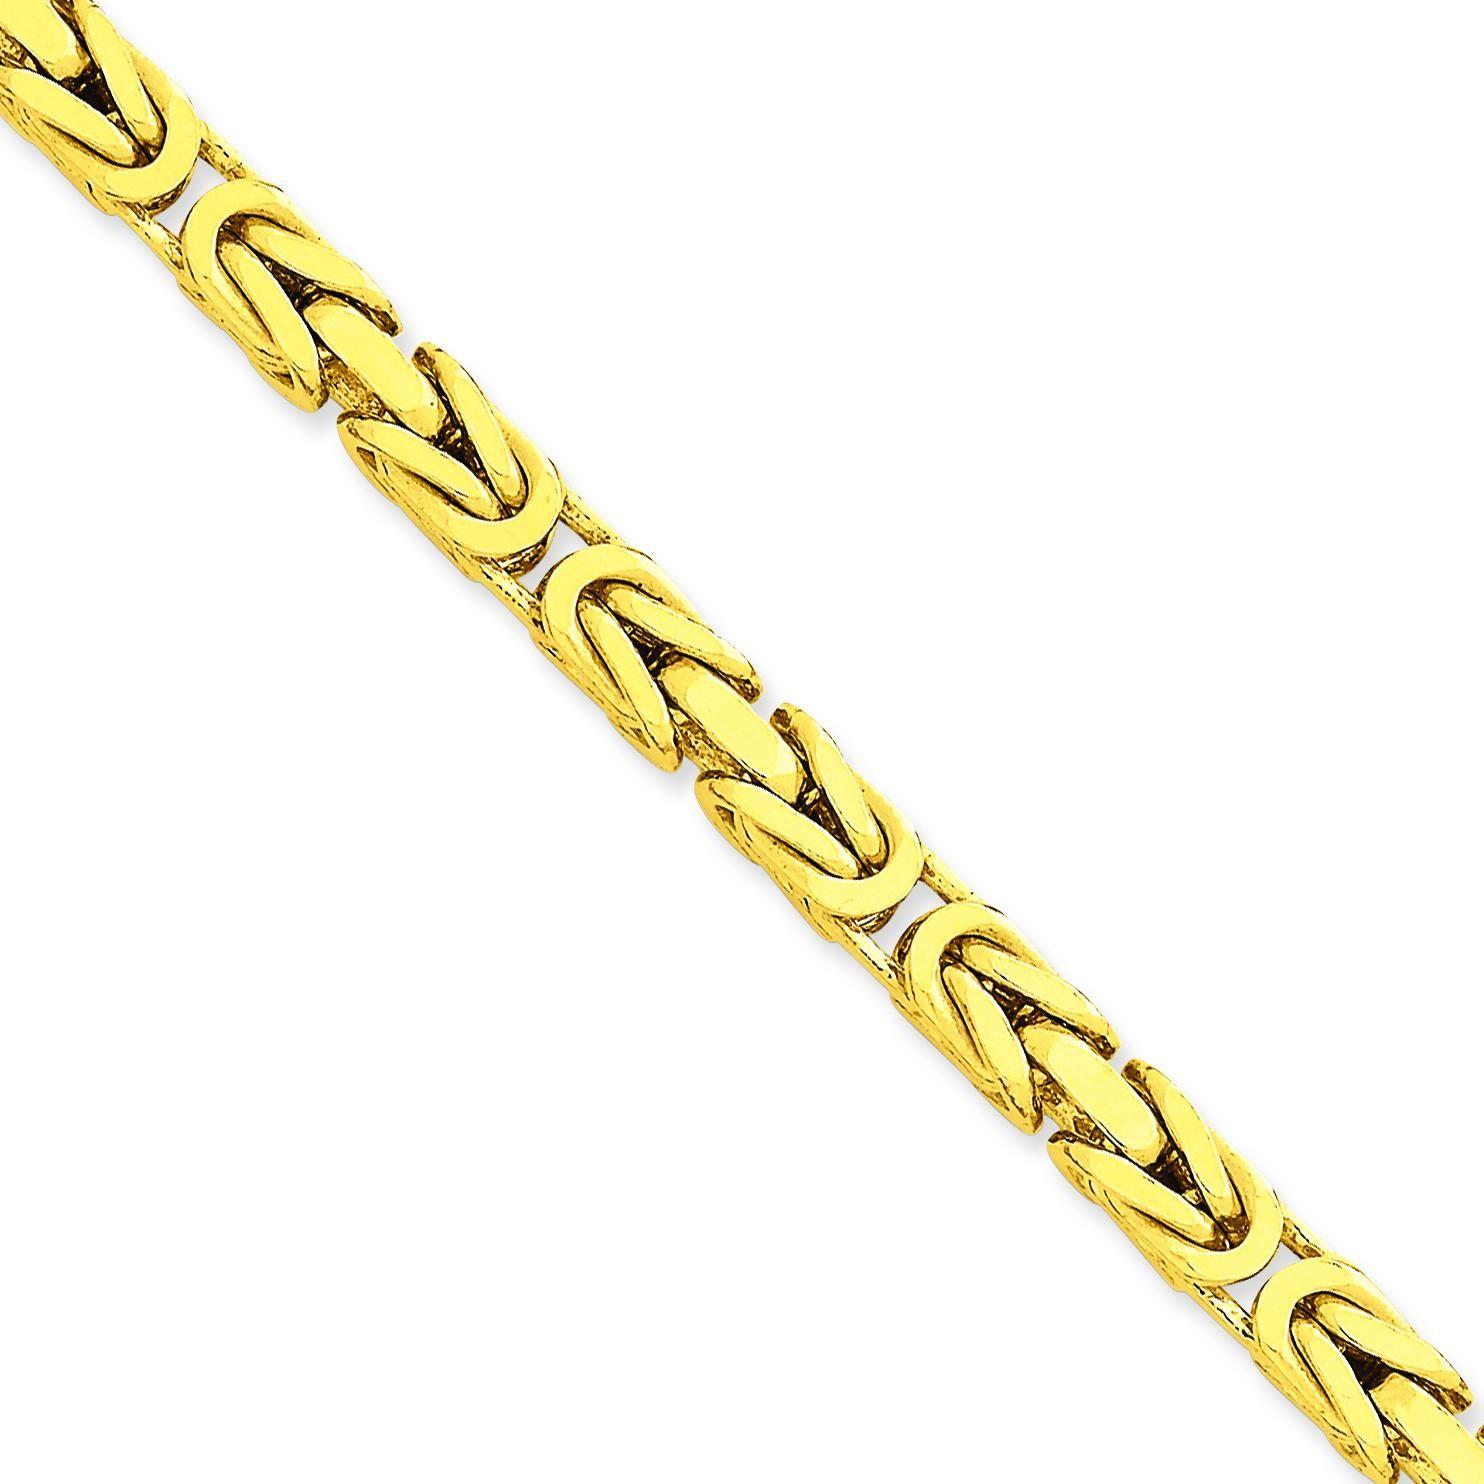 14k Yellow Gold 8 inch 5.25 mm Byzantine Chain Bracelet